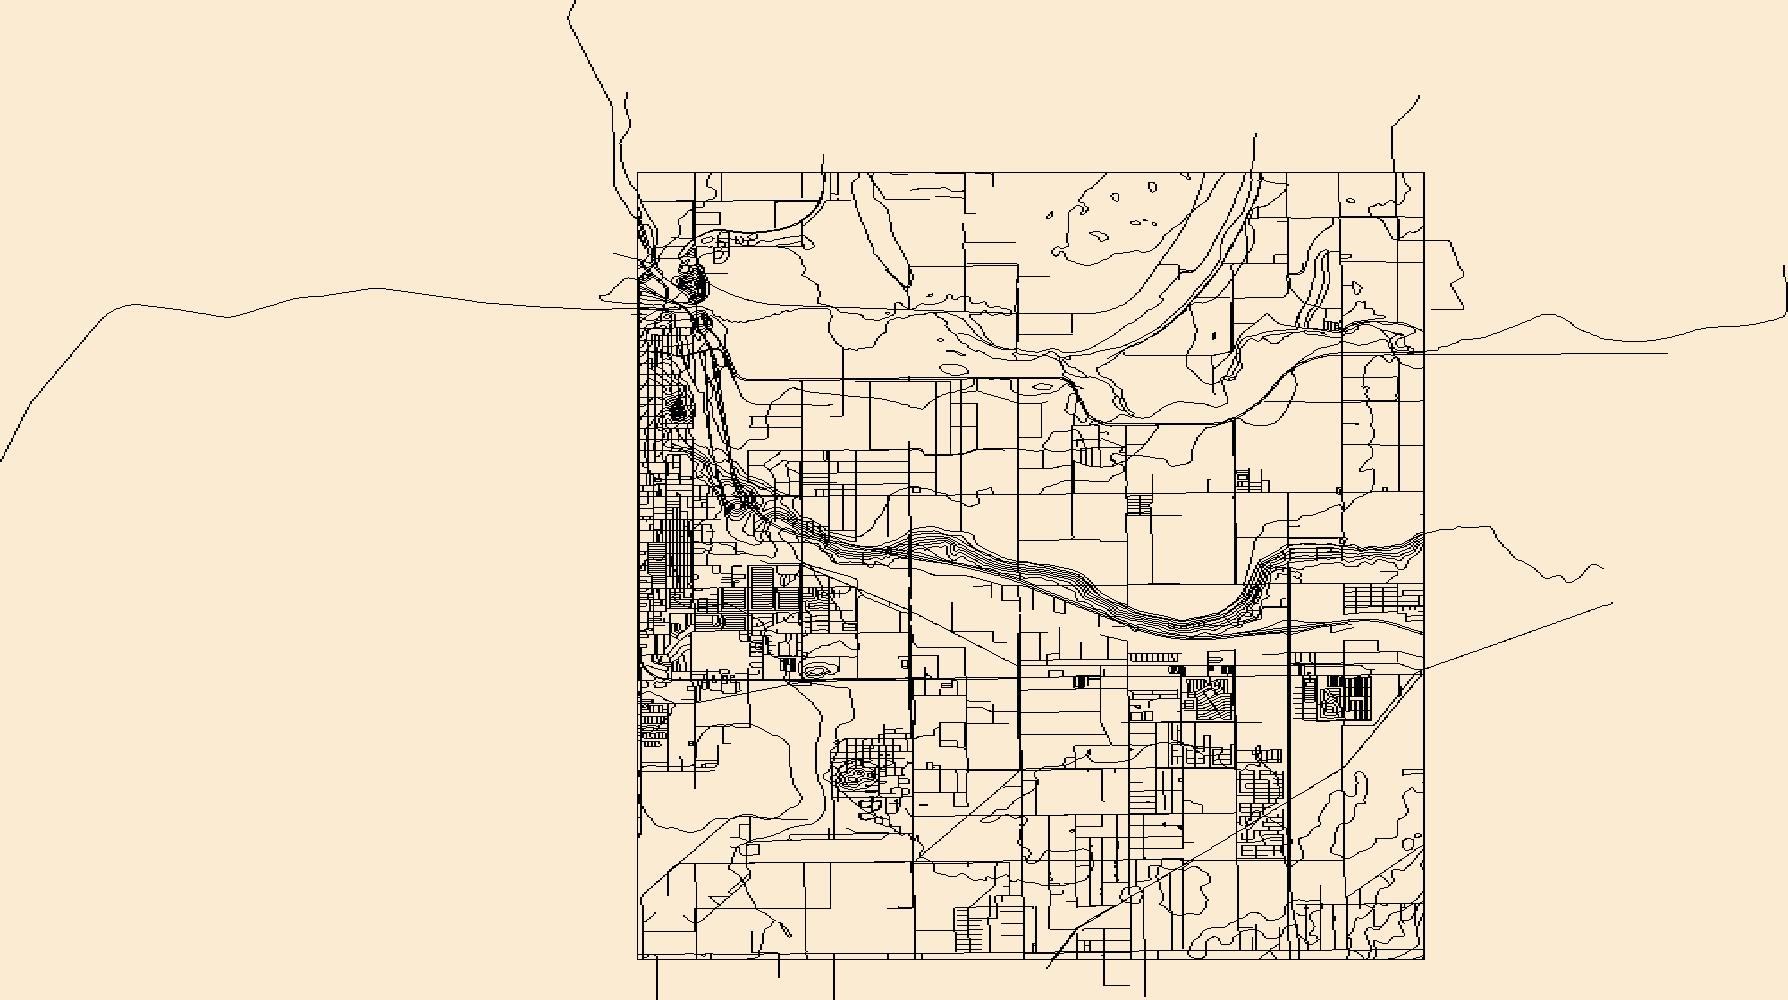 Topo Map Of Arizona.Usgs Topo Map Vector Data Vector 50193 Yuma East Arizona 20180807